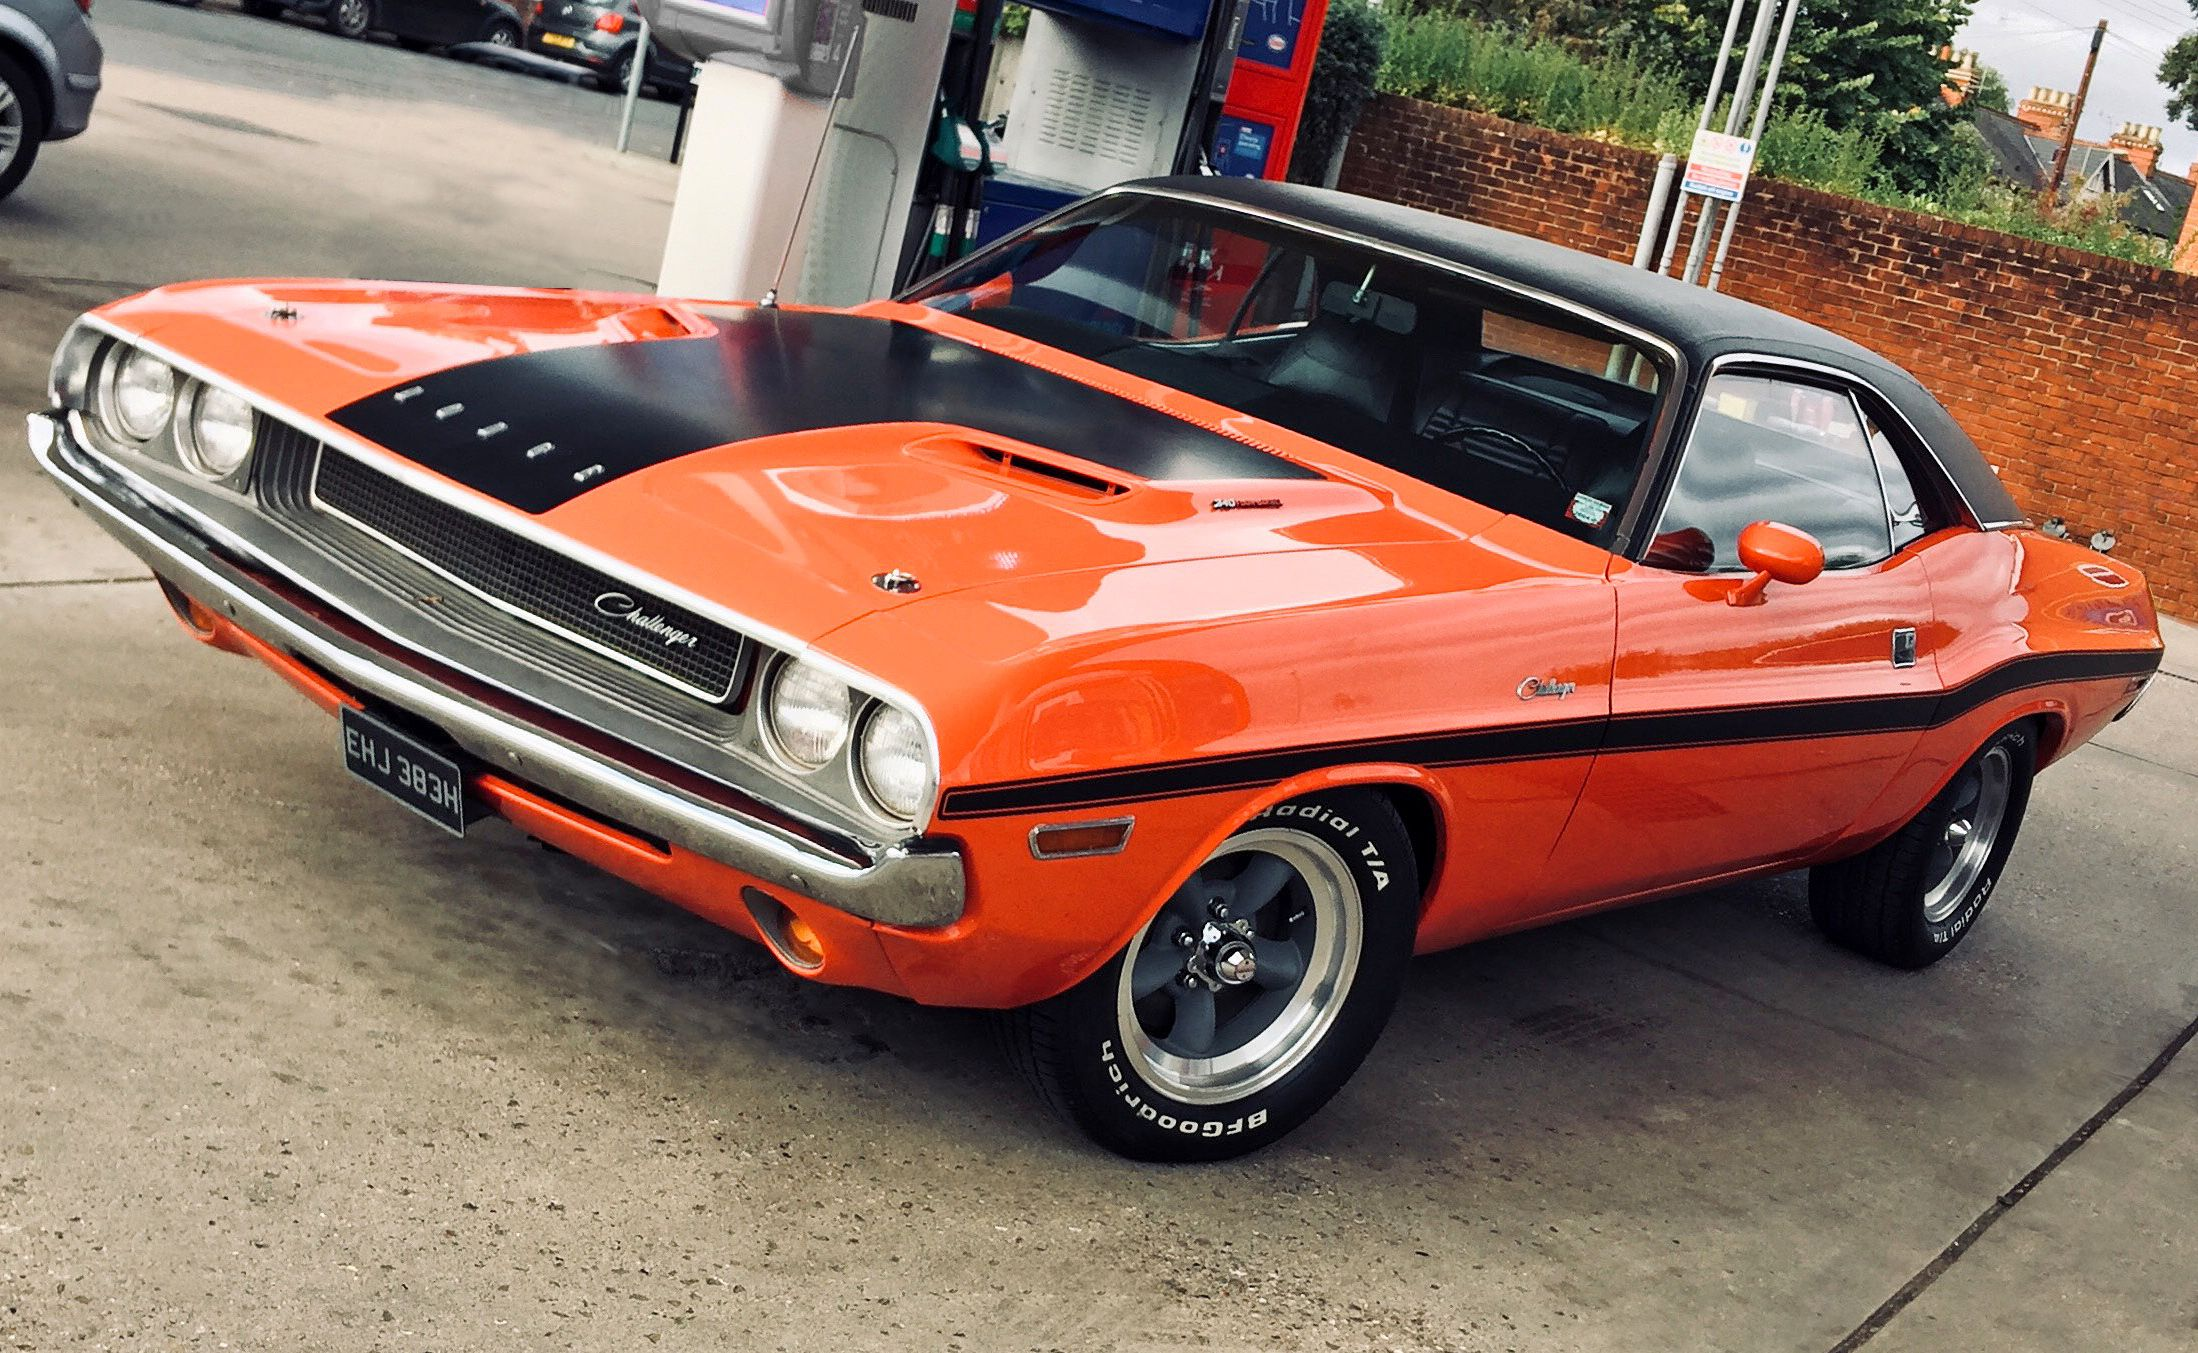 1970 Dodge Challenger A66 Dodge Challenger 1970 Dodge Challenger